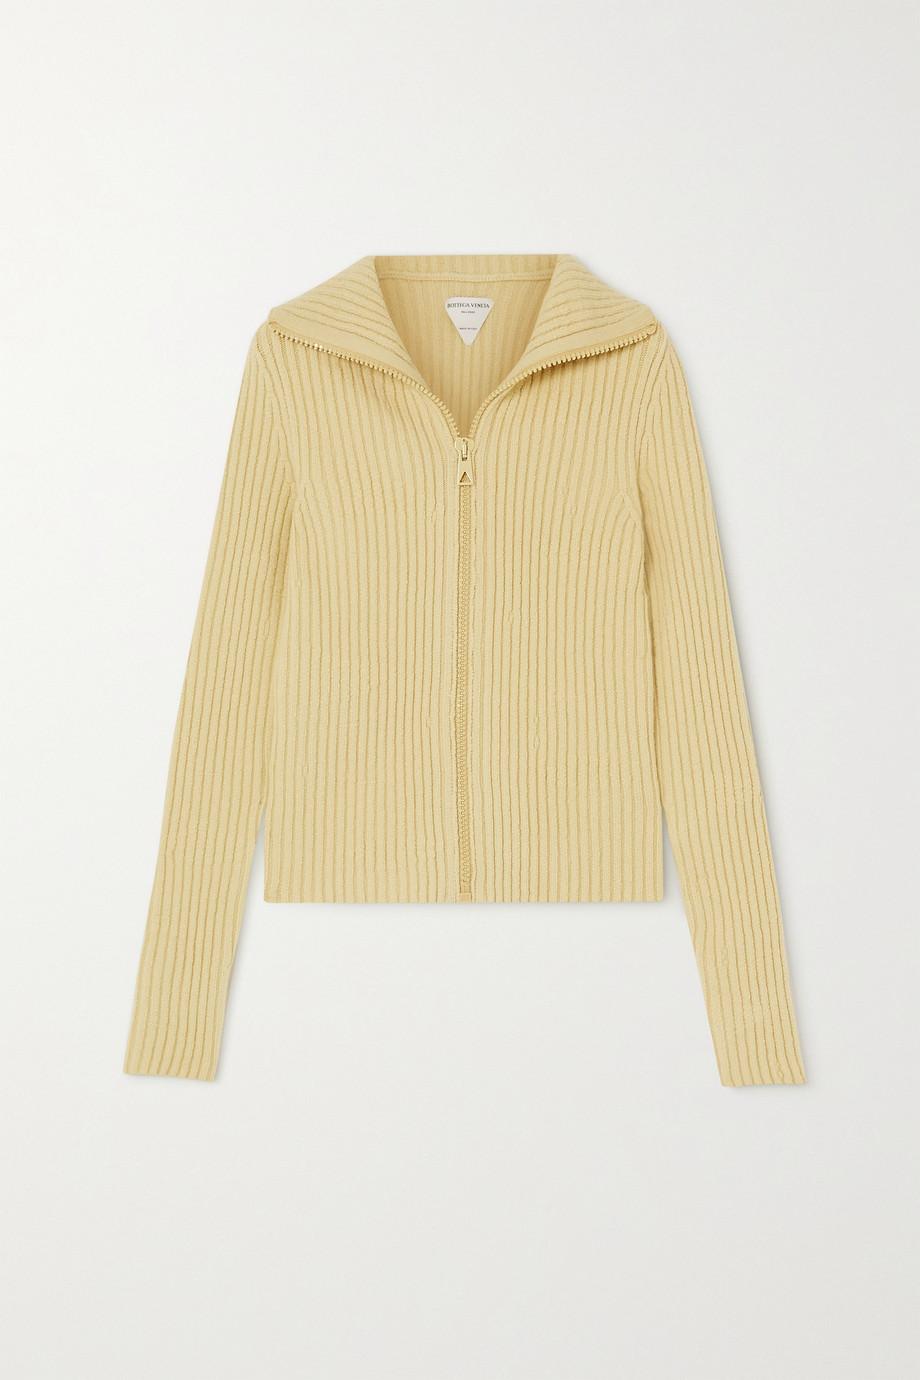 Bottega Veneta Ribbed wool-blend cardigan